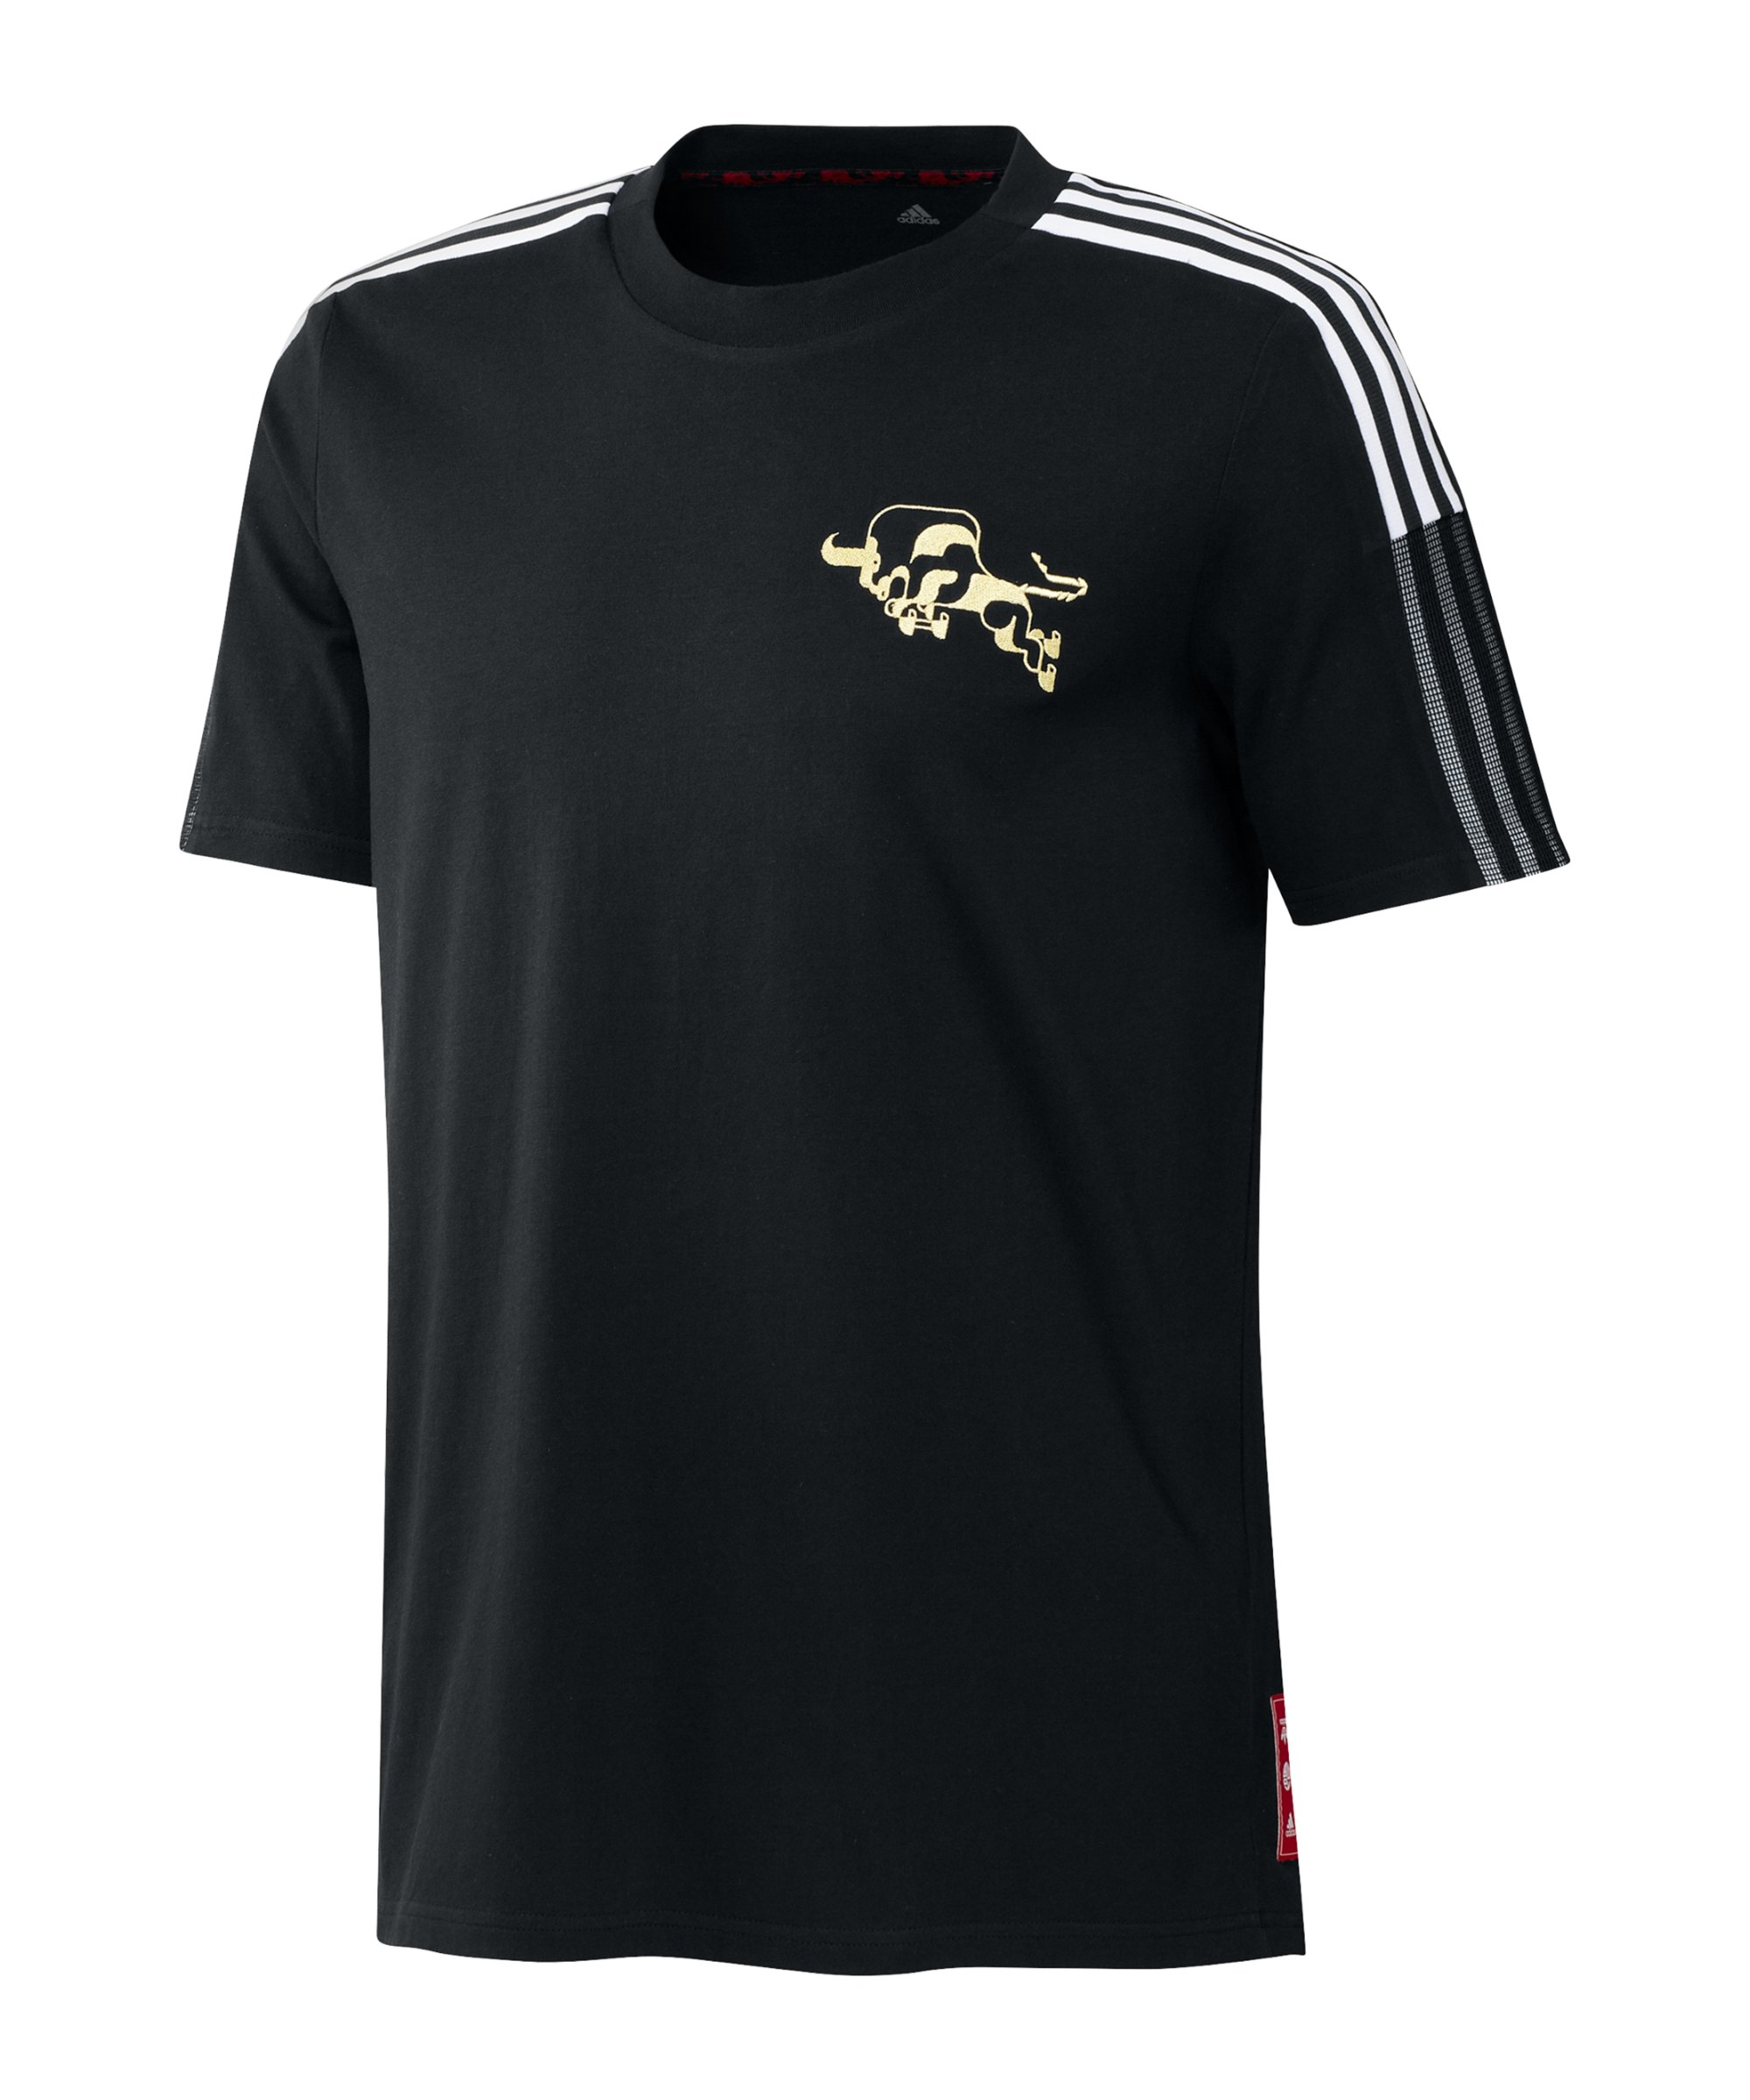 adidas Manchester United CNY T-Shirt Schwarz - schwarz